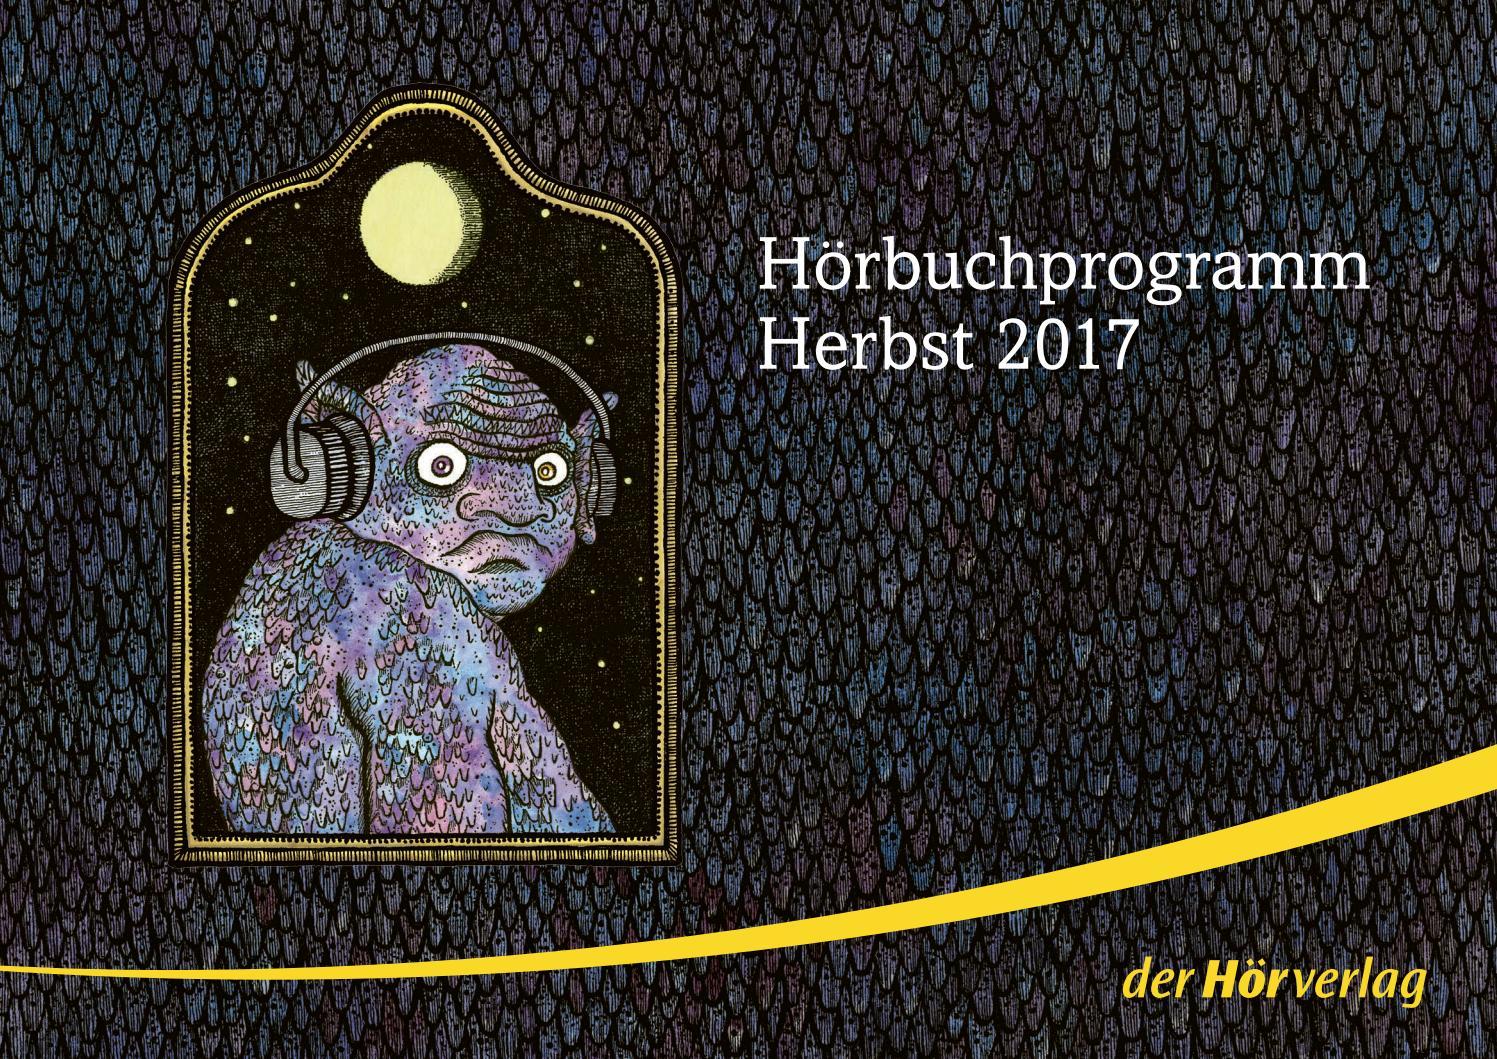 Der Hörverlag Vorschau Herbst 2017 By Verlagsgruppe Random